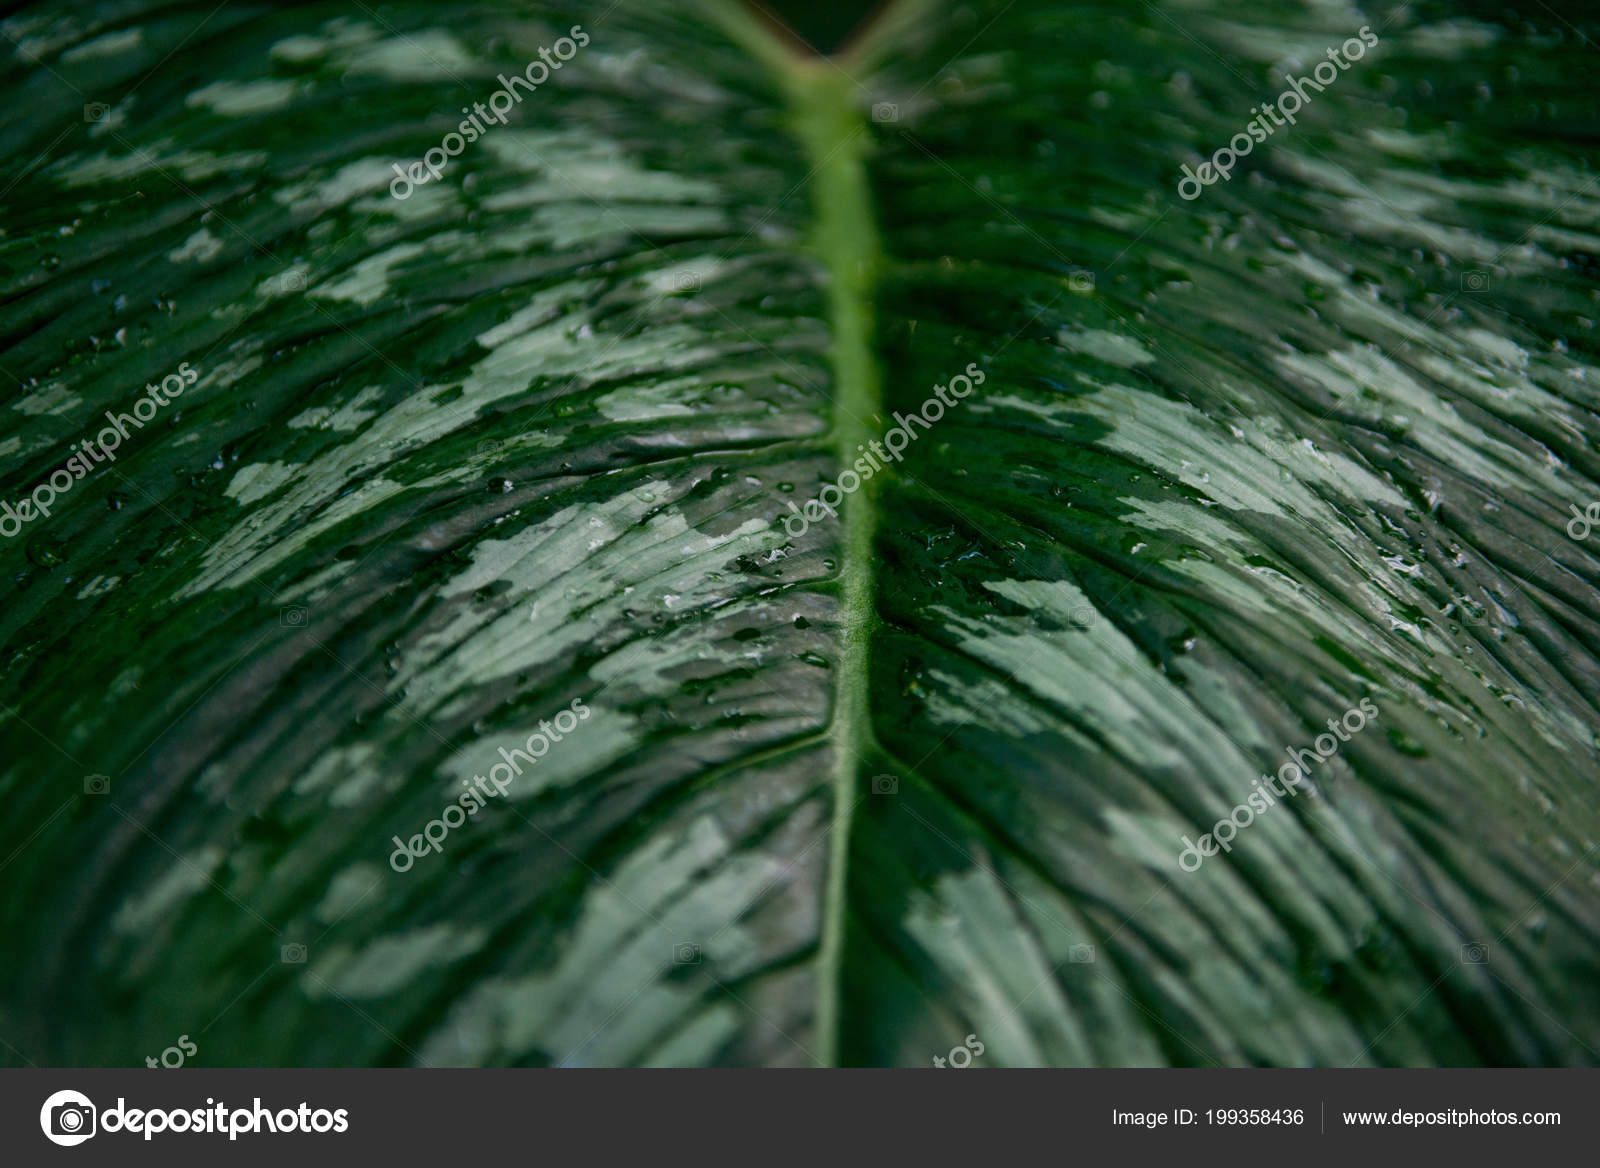 Imagen Fotograma Completo Hojas Anthurium Con Agua Gotas — Foto de ...